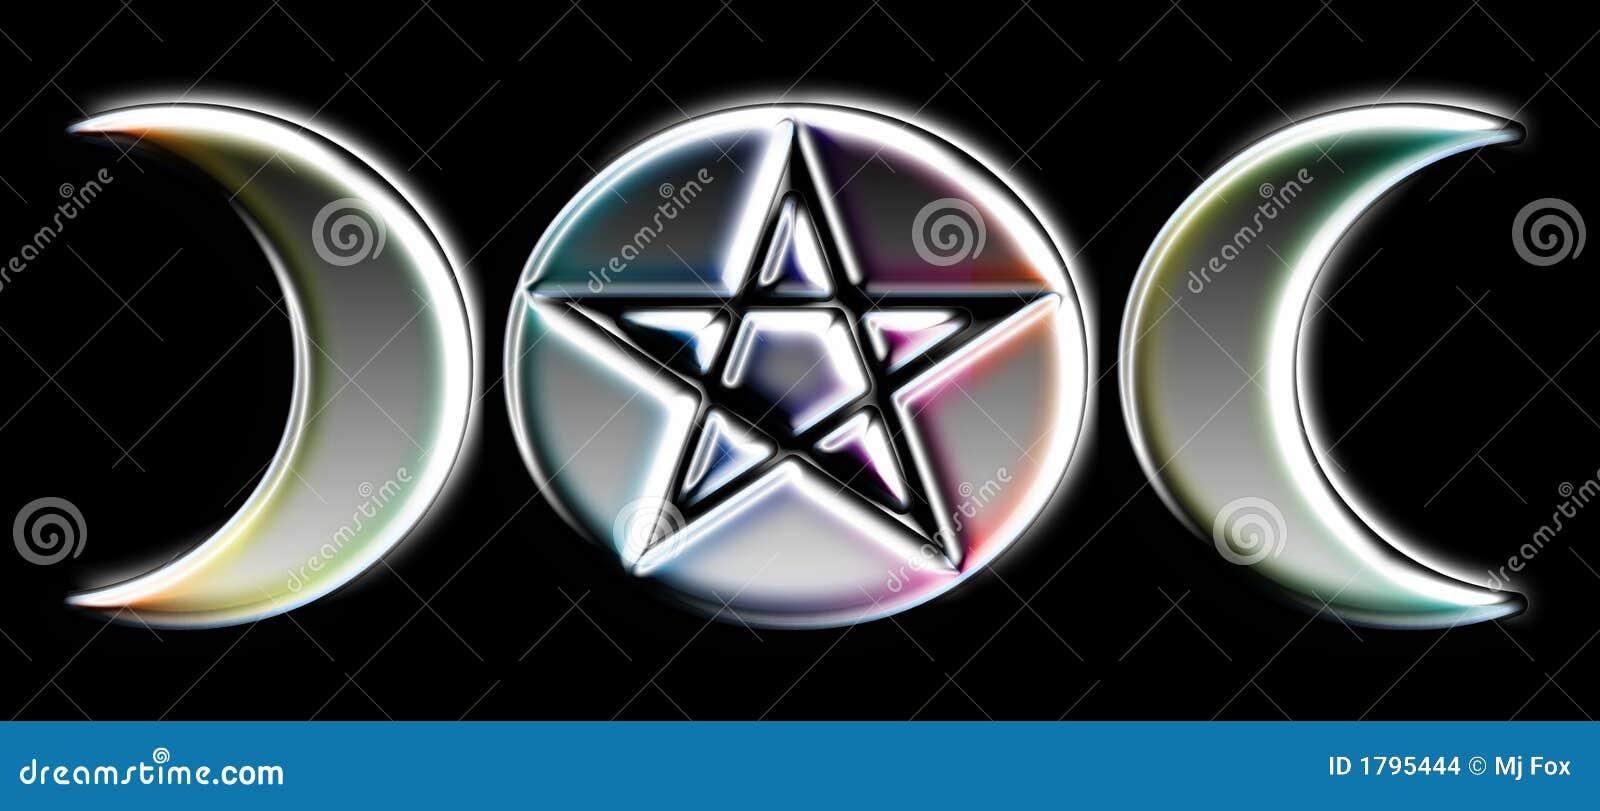 three moons wicca - photo #37